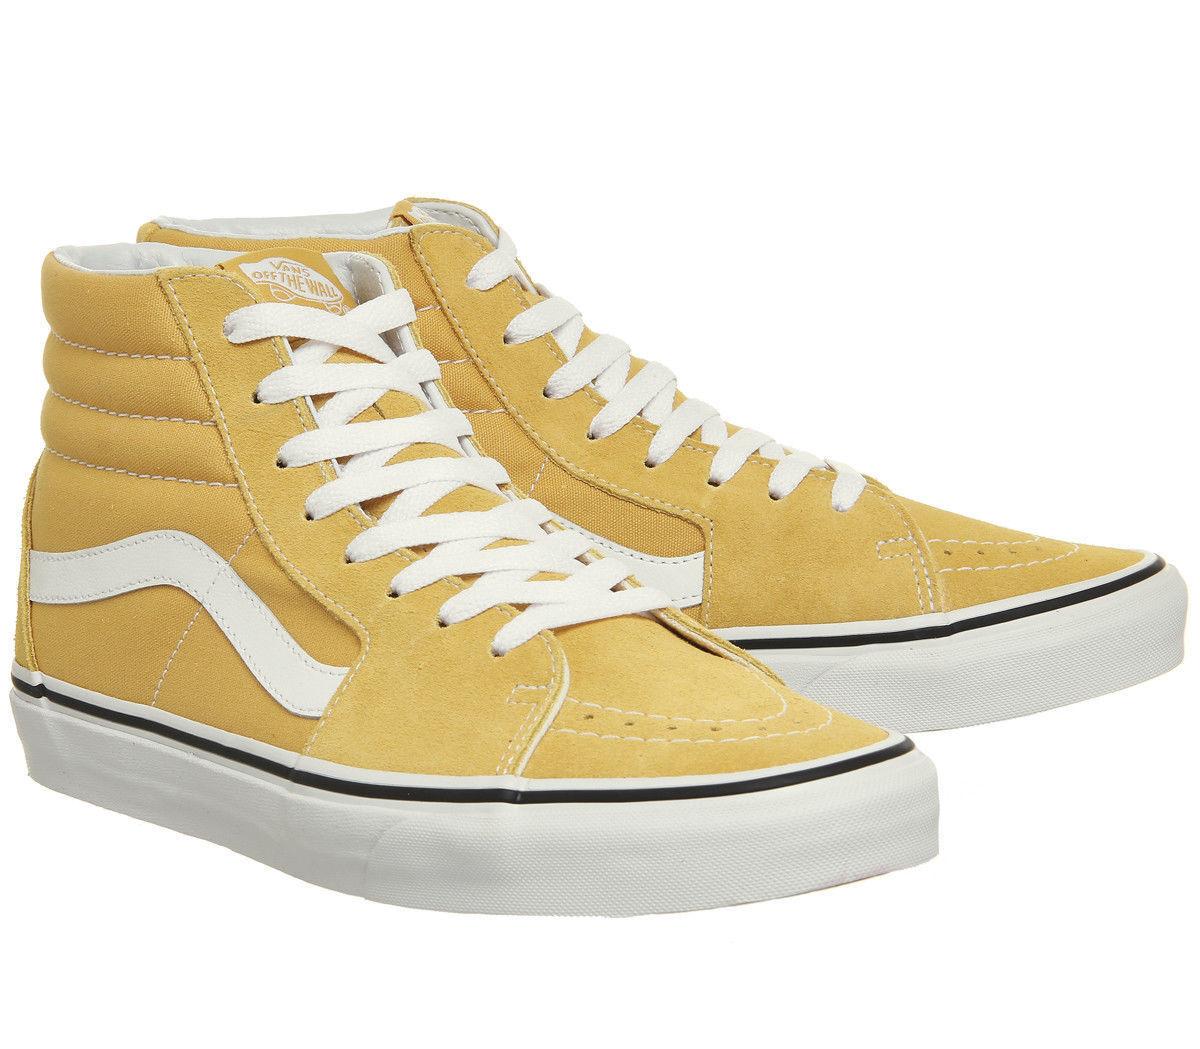 Vans Ochre Yellow True White Sk8 Hi Mens shoes